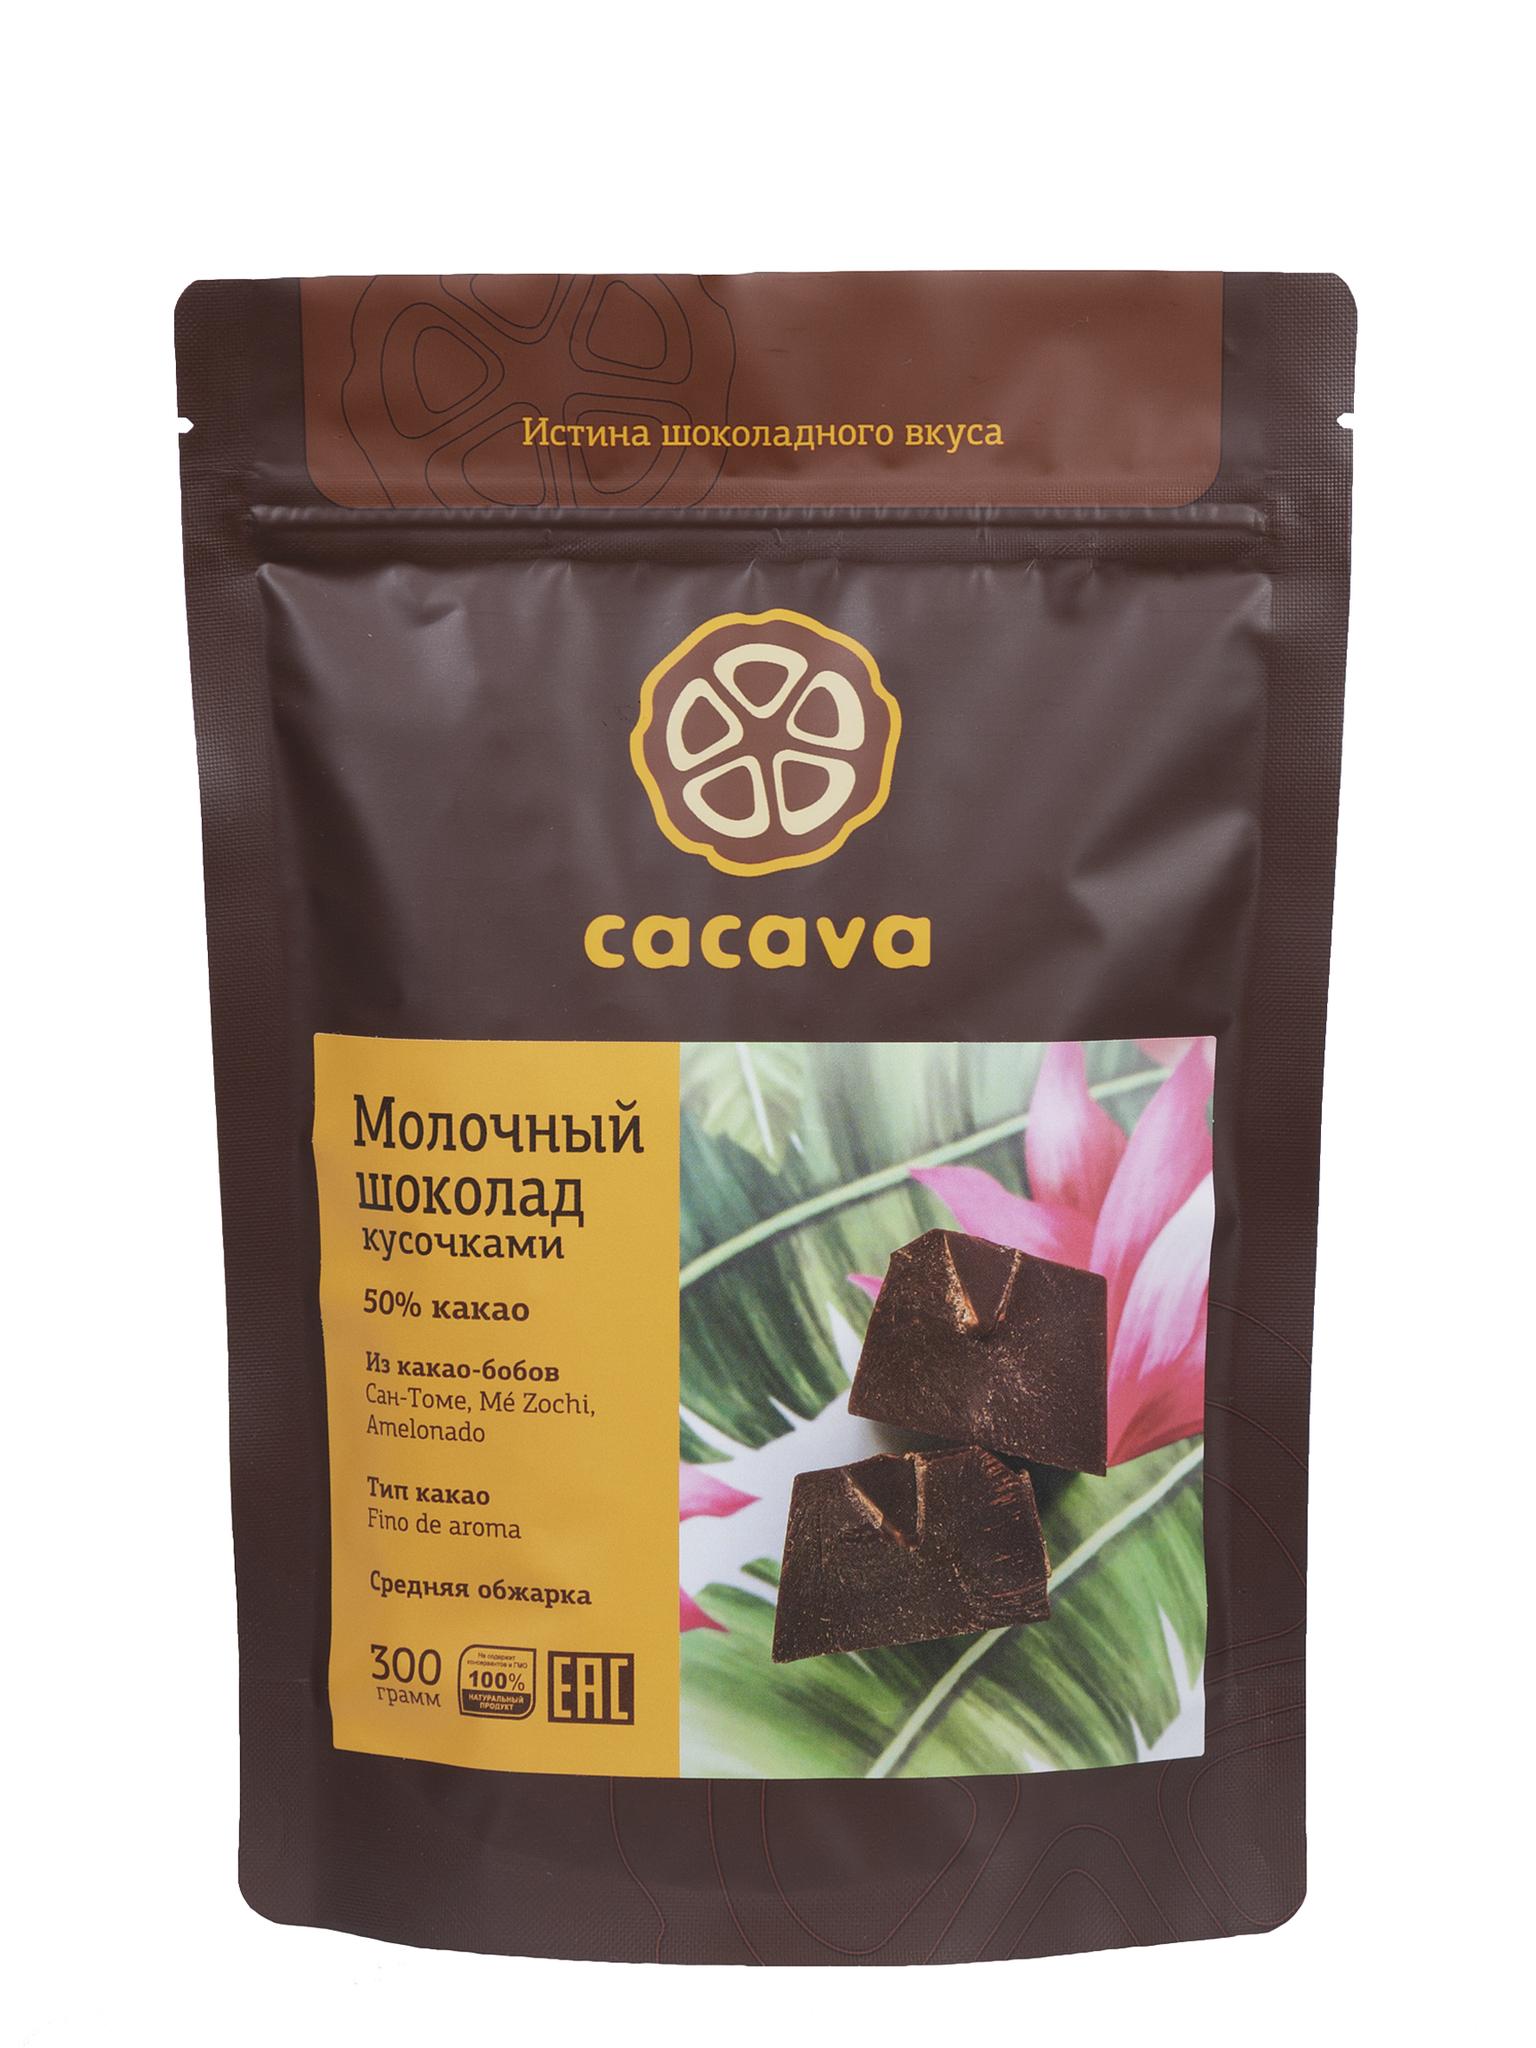 Молочный шоколад 50 % какао (Сан-Томе), упаковка 300 грамм